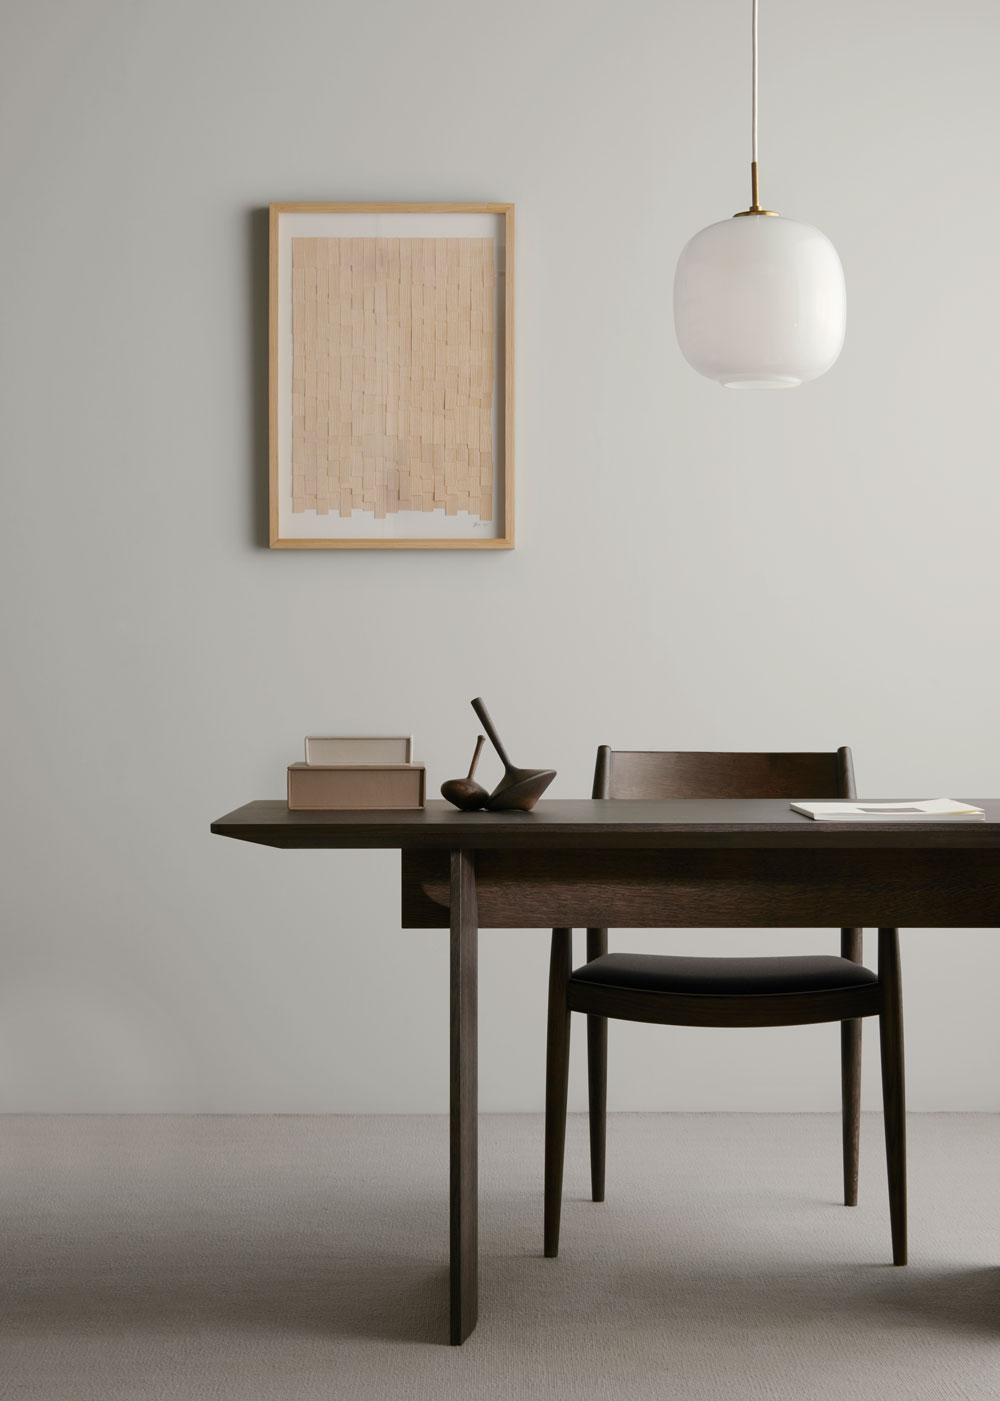 ilaria fatone - minimal esthetics - workspace